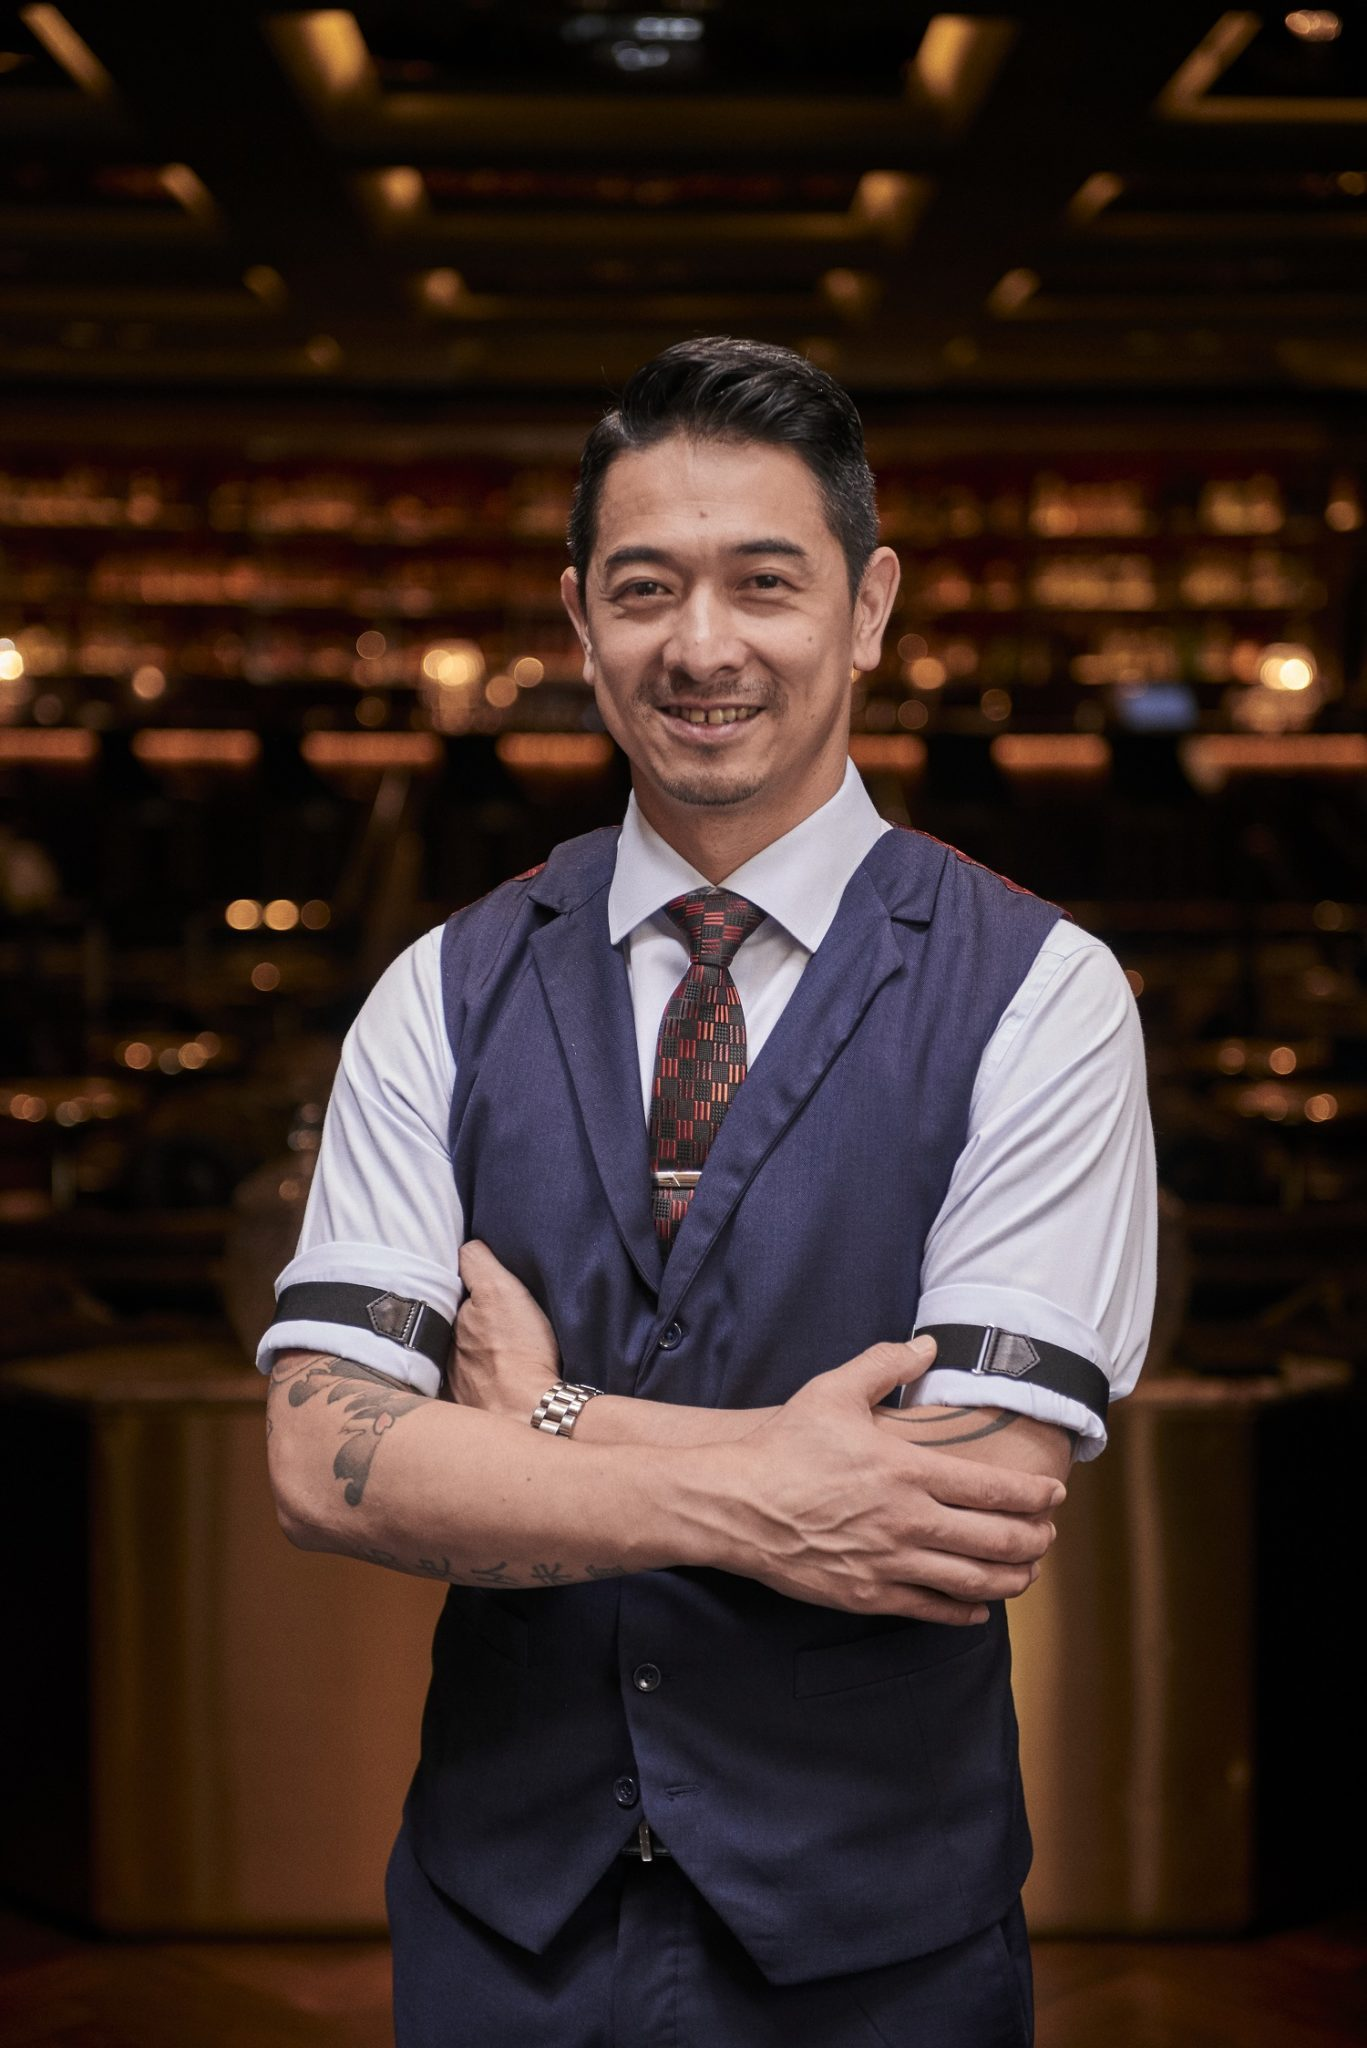 regent singapore manhattan manhattan bar manager david nguyen lu resized 1 1